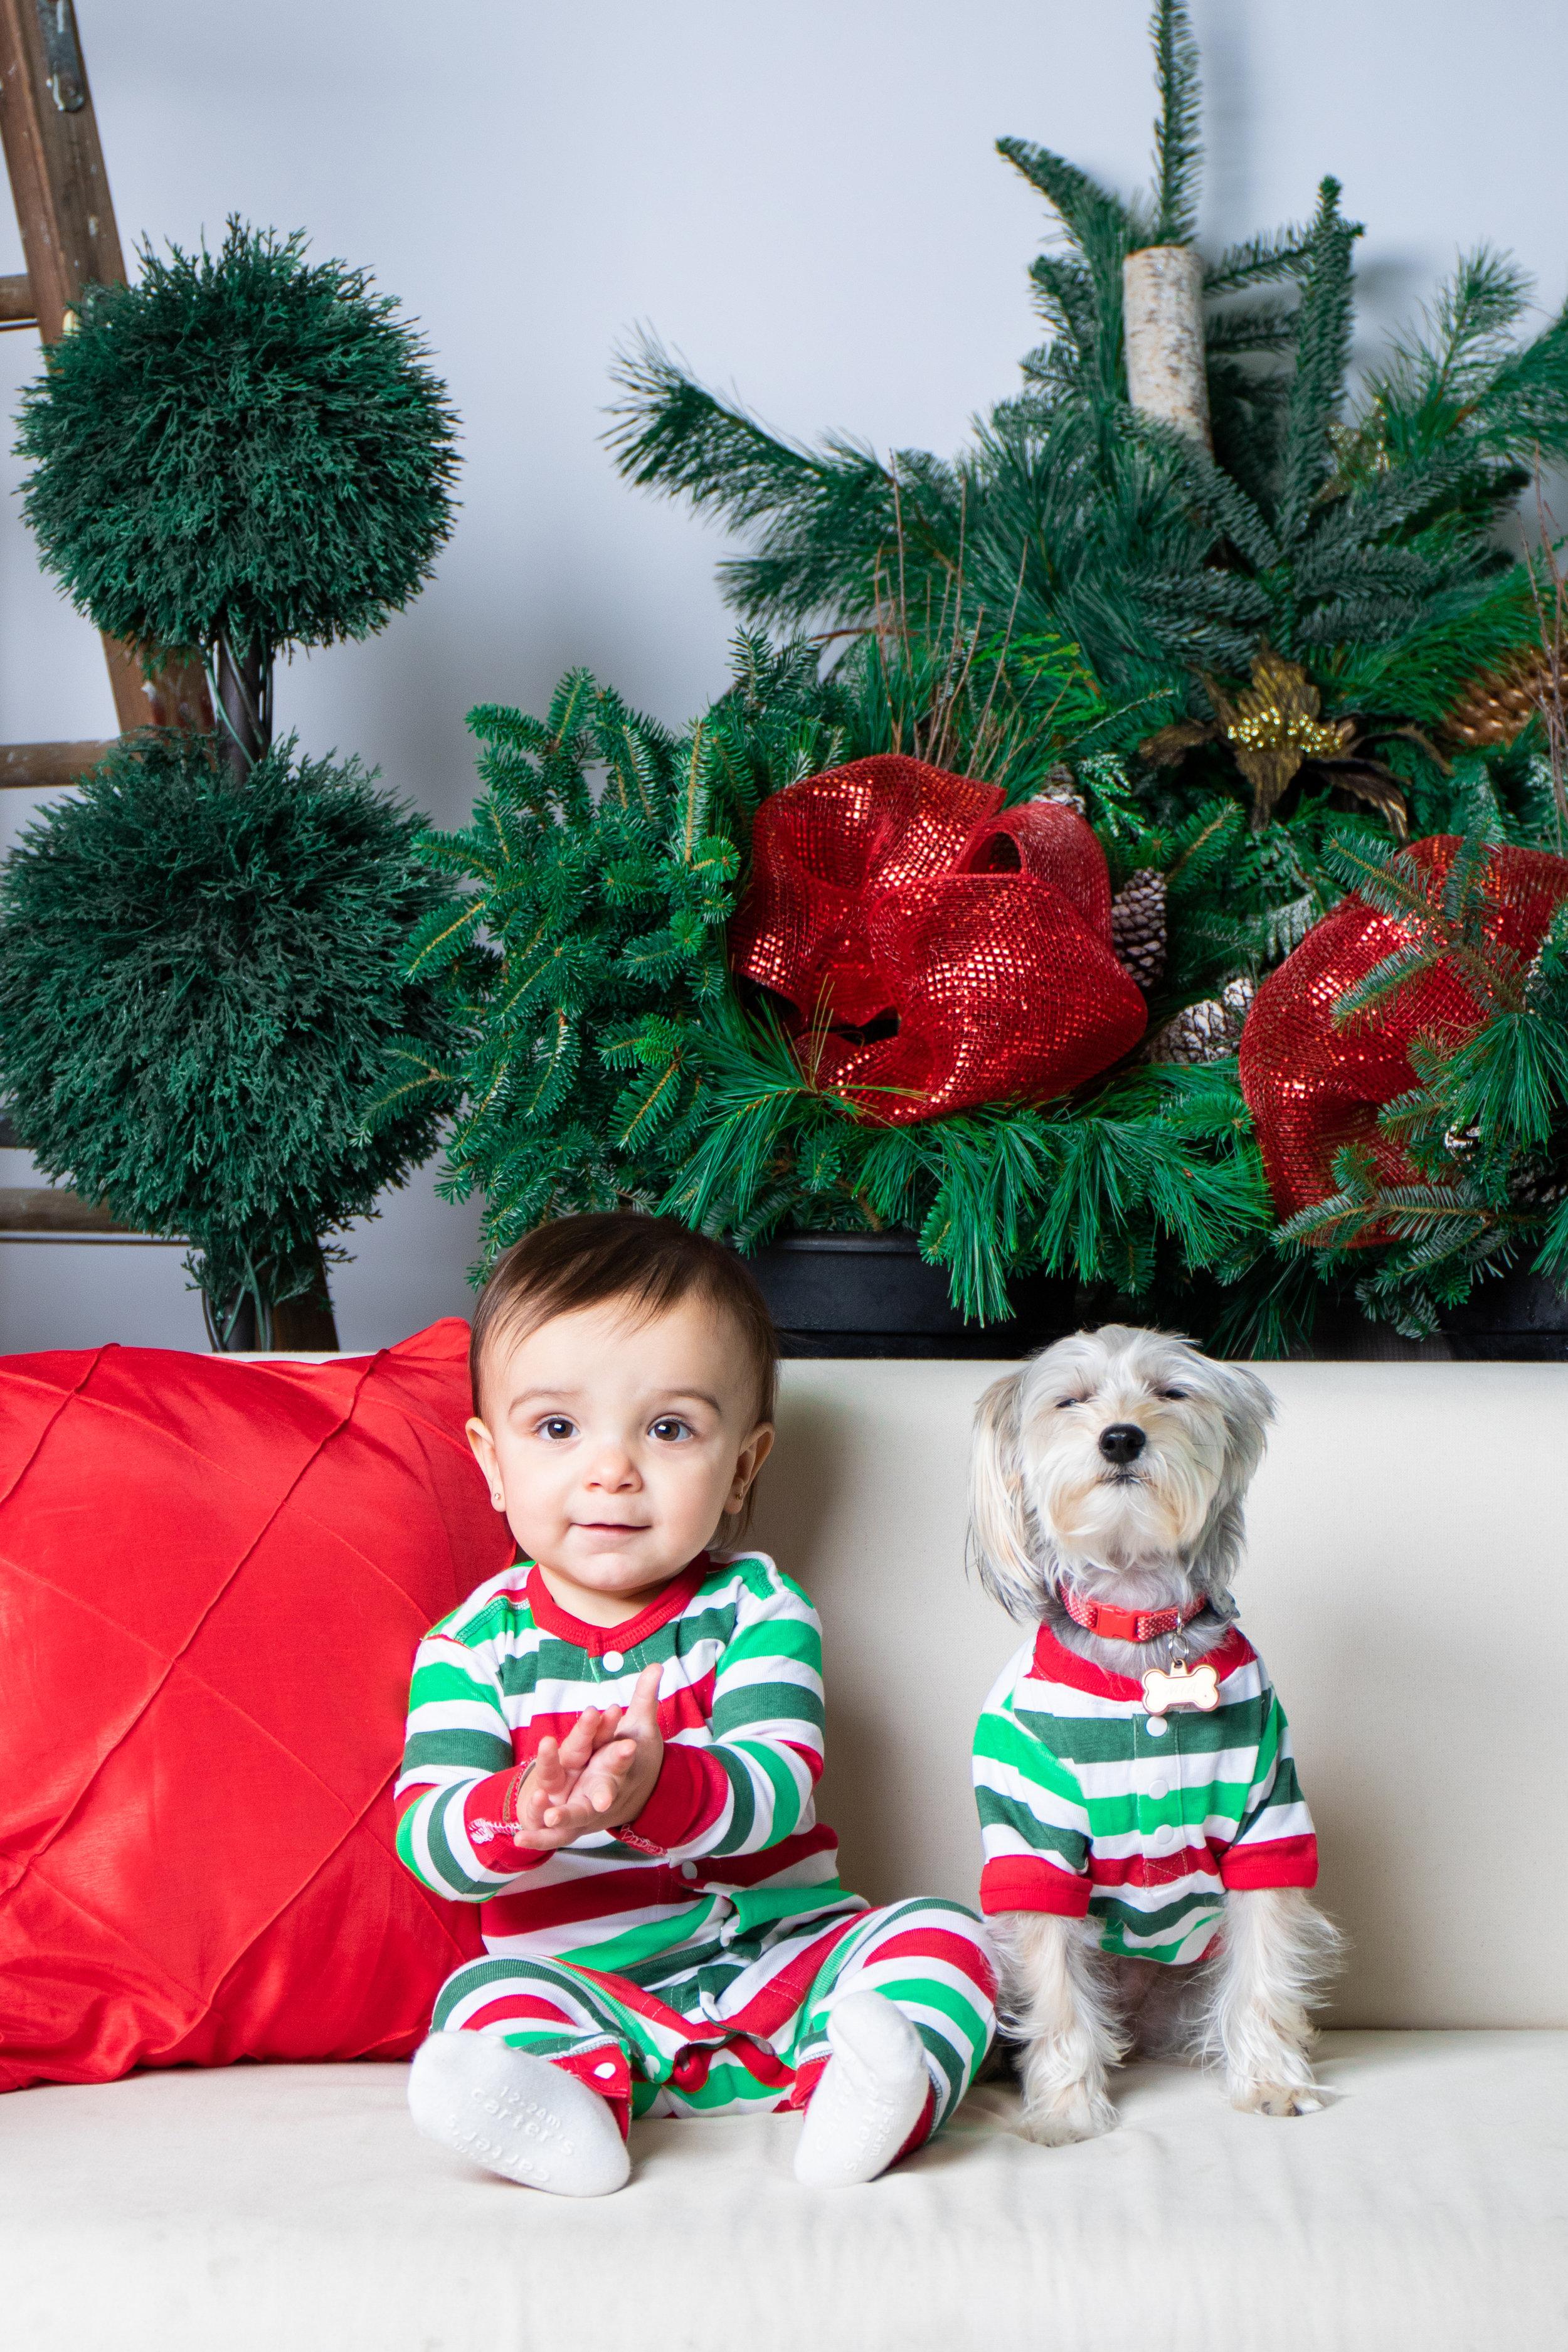 SophiaChristinaRob_ChristmasMini-12.jpg